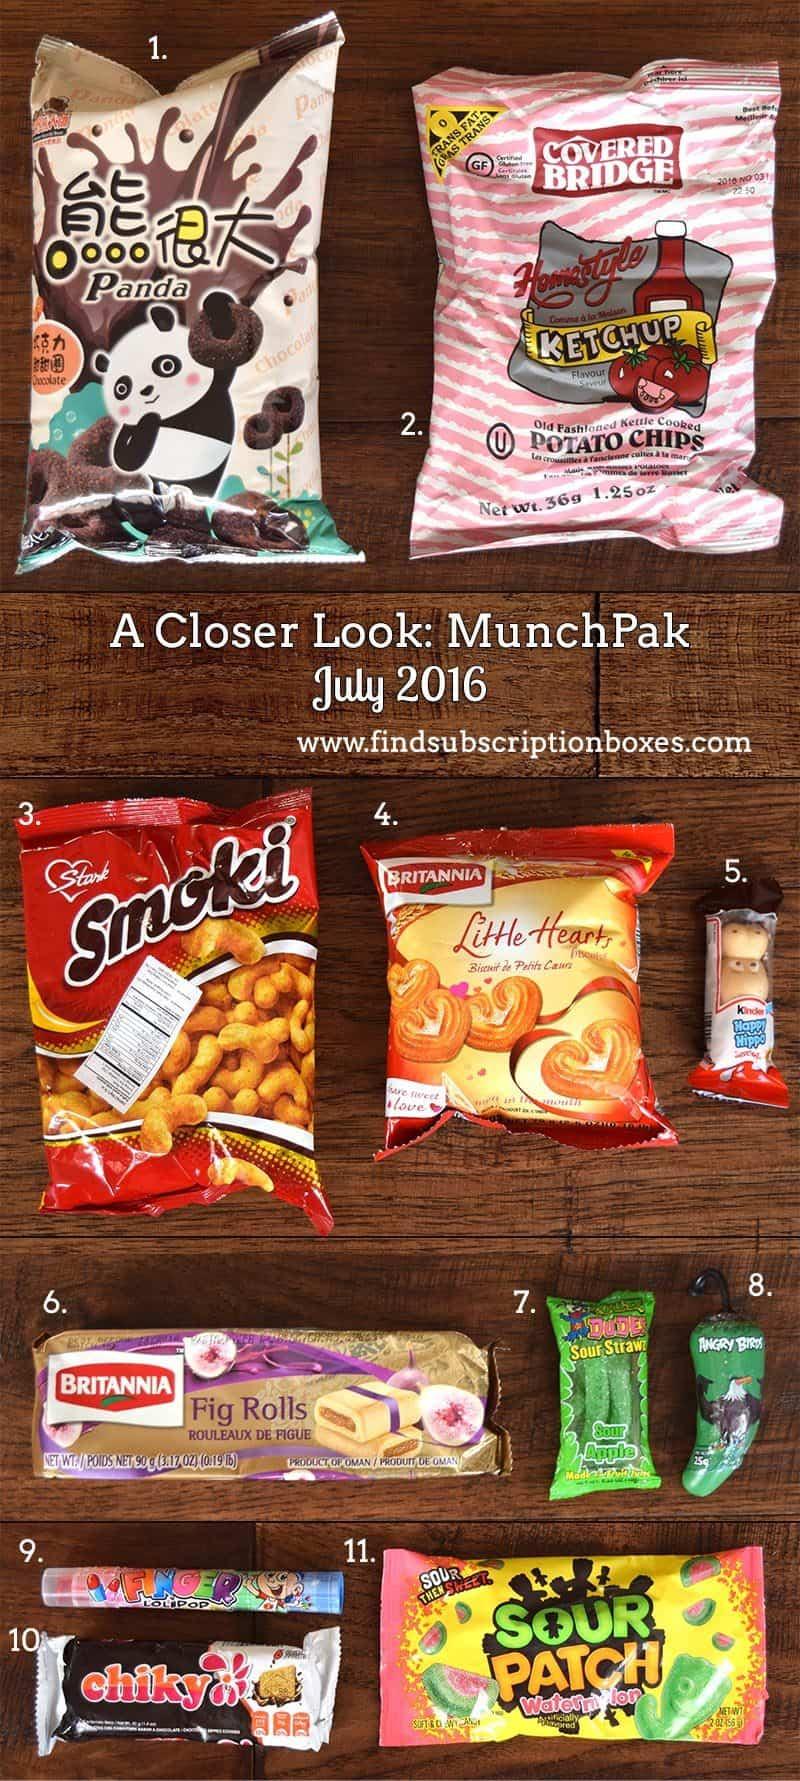 July 2016 MunchPak Review - Inside the Box